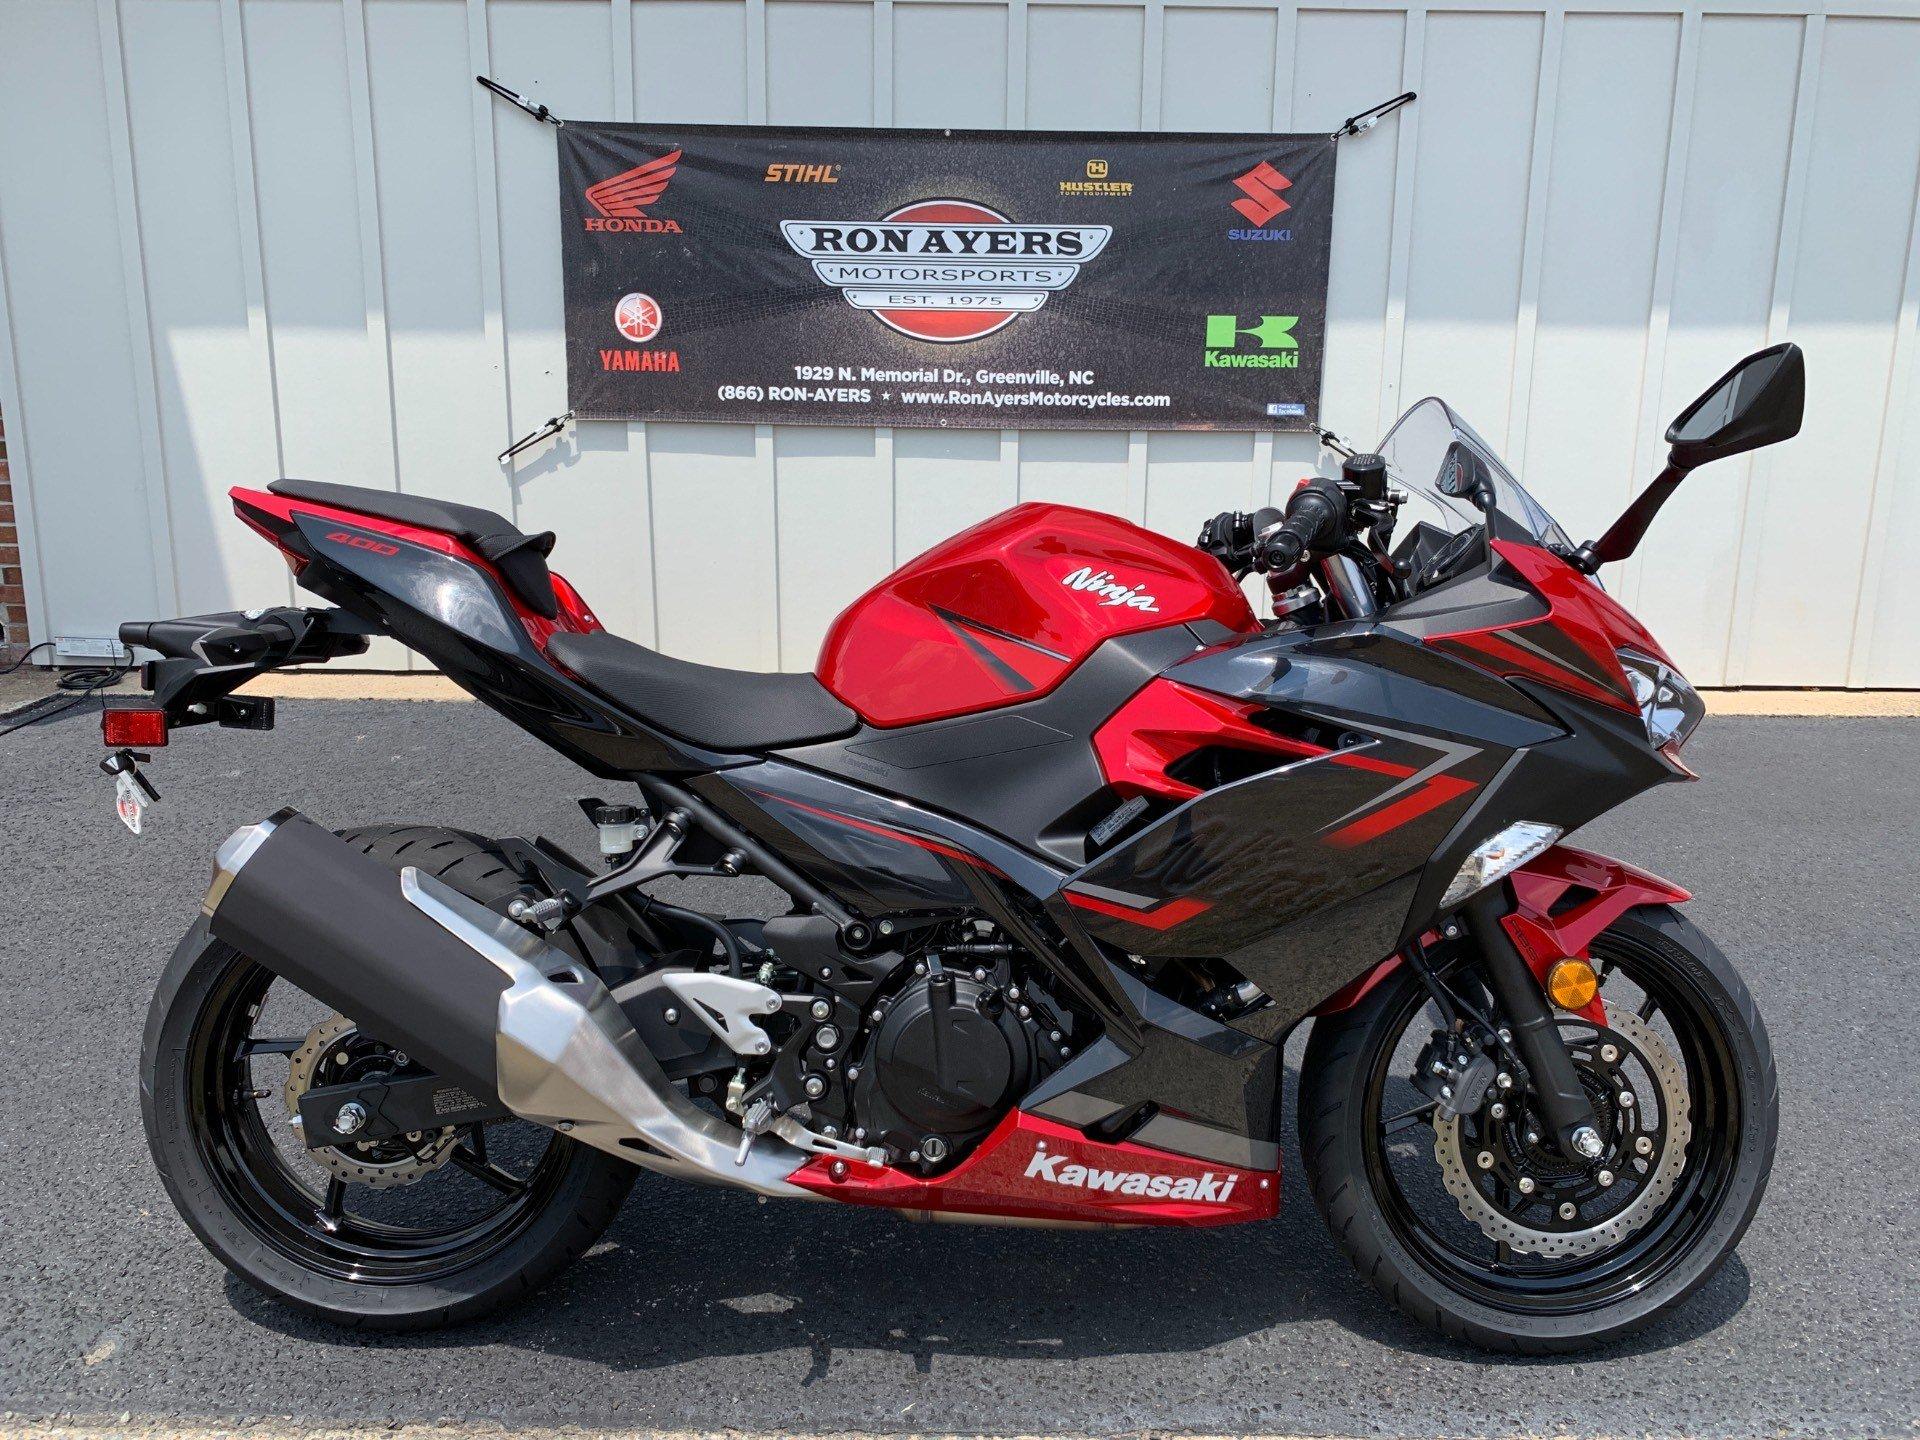 2019 Kawasaki Ninja 400 Abs In Greenville North Carolina